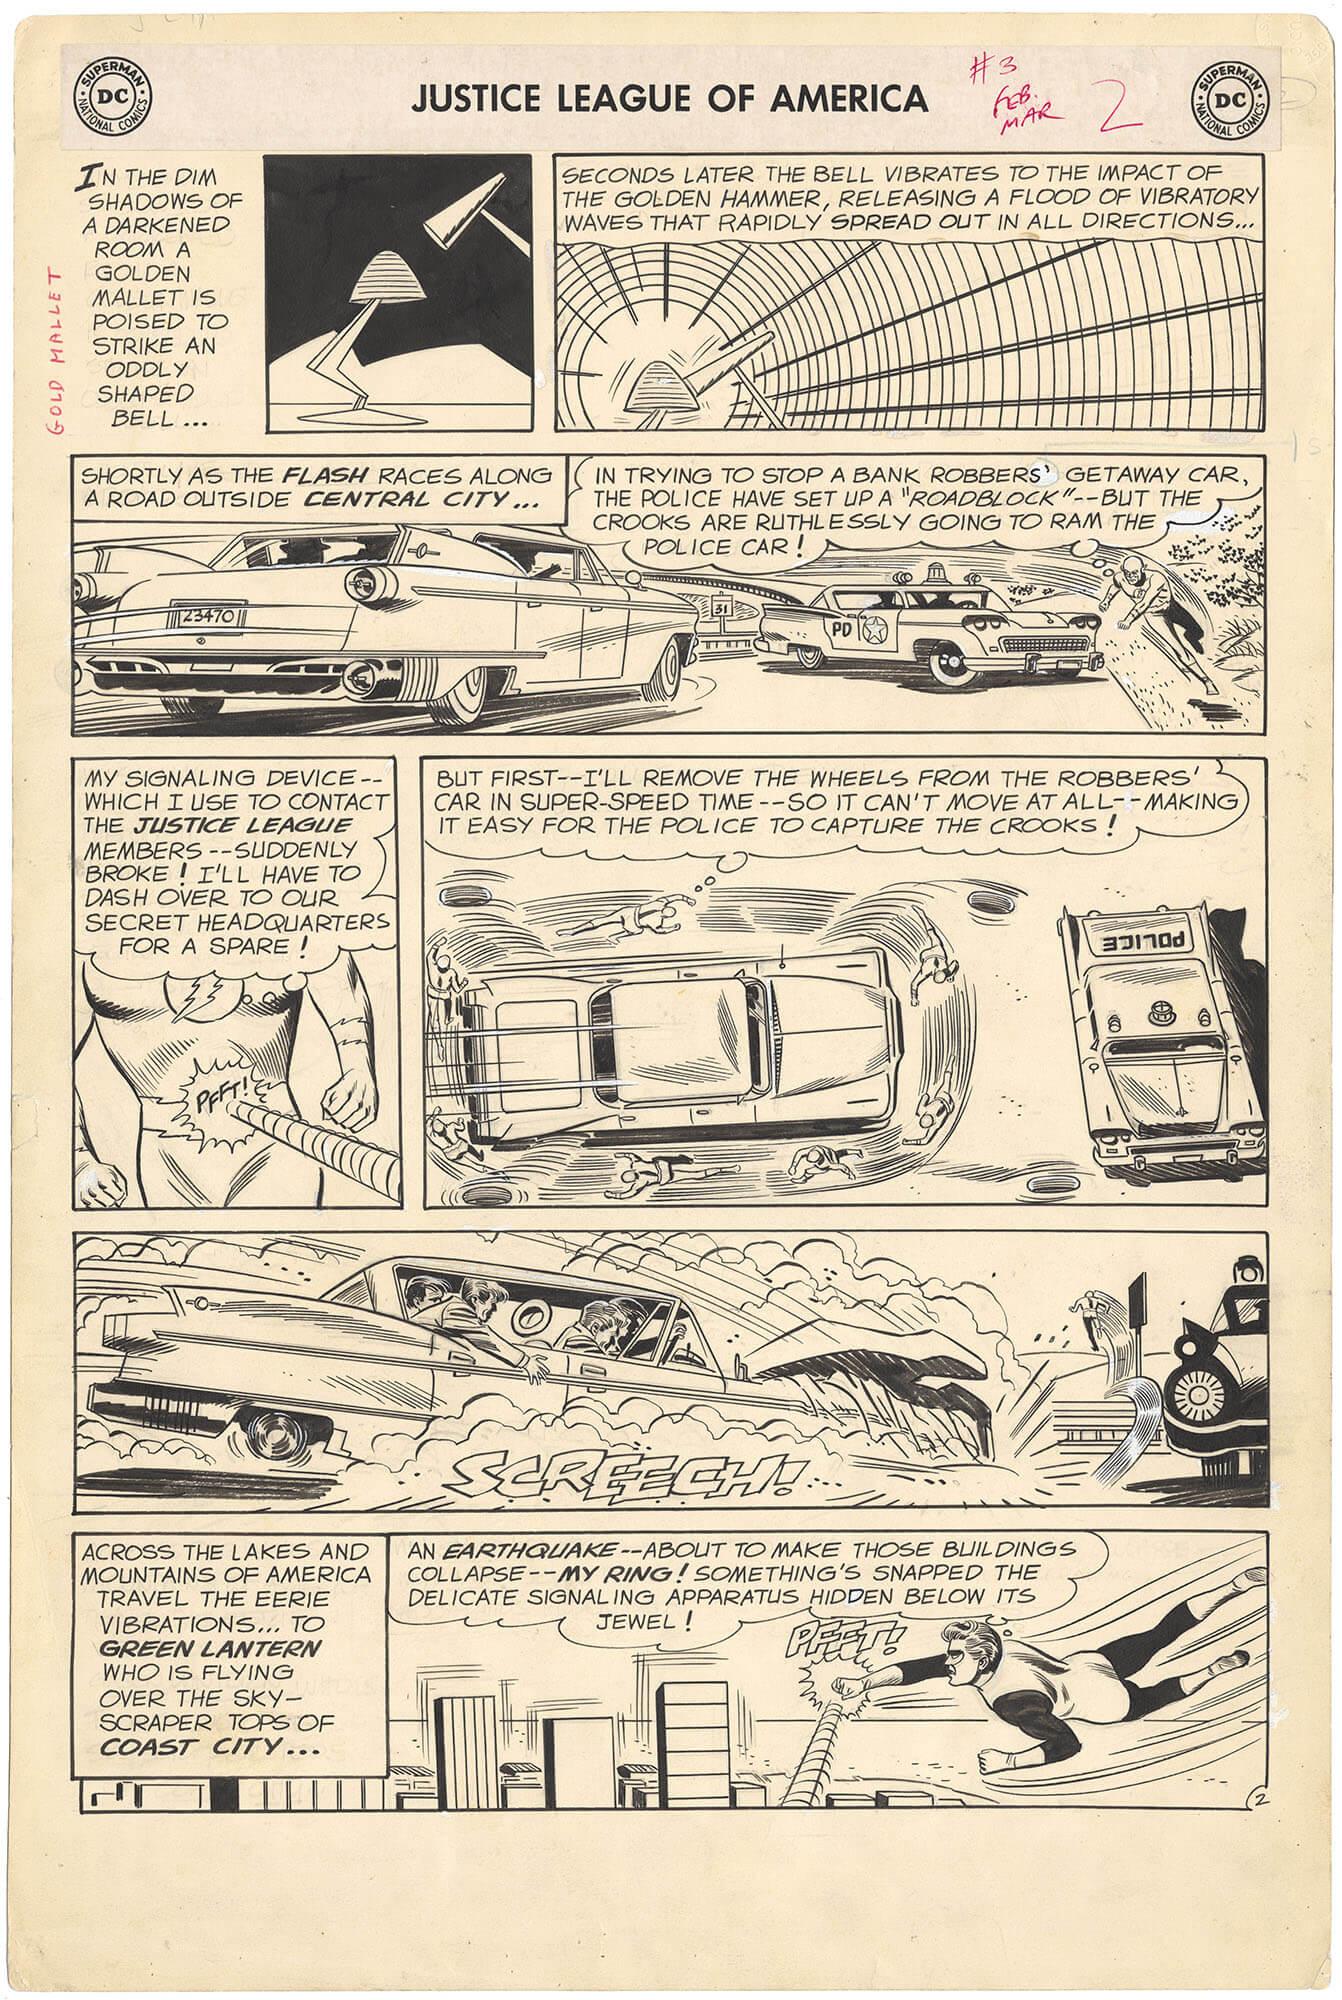 Justice League of America #3 p2 (Large Art)